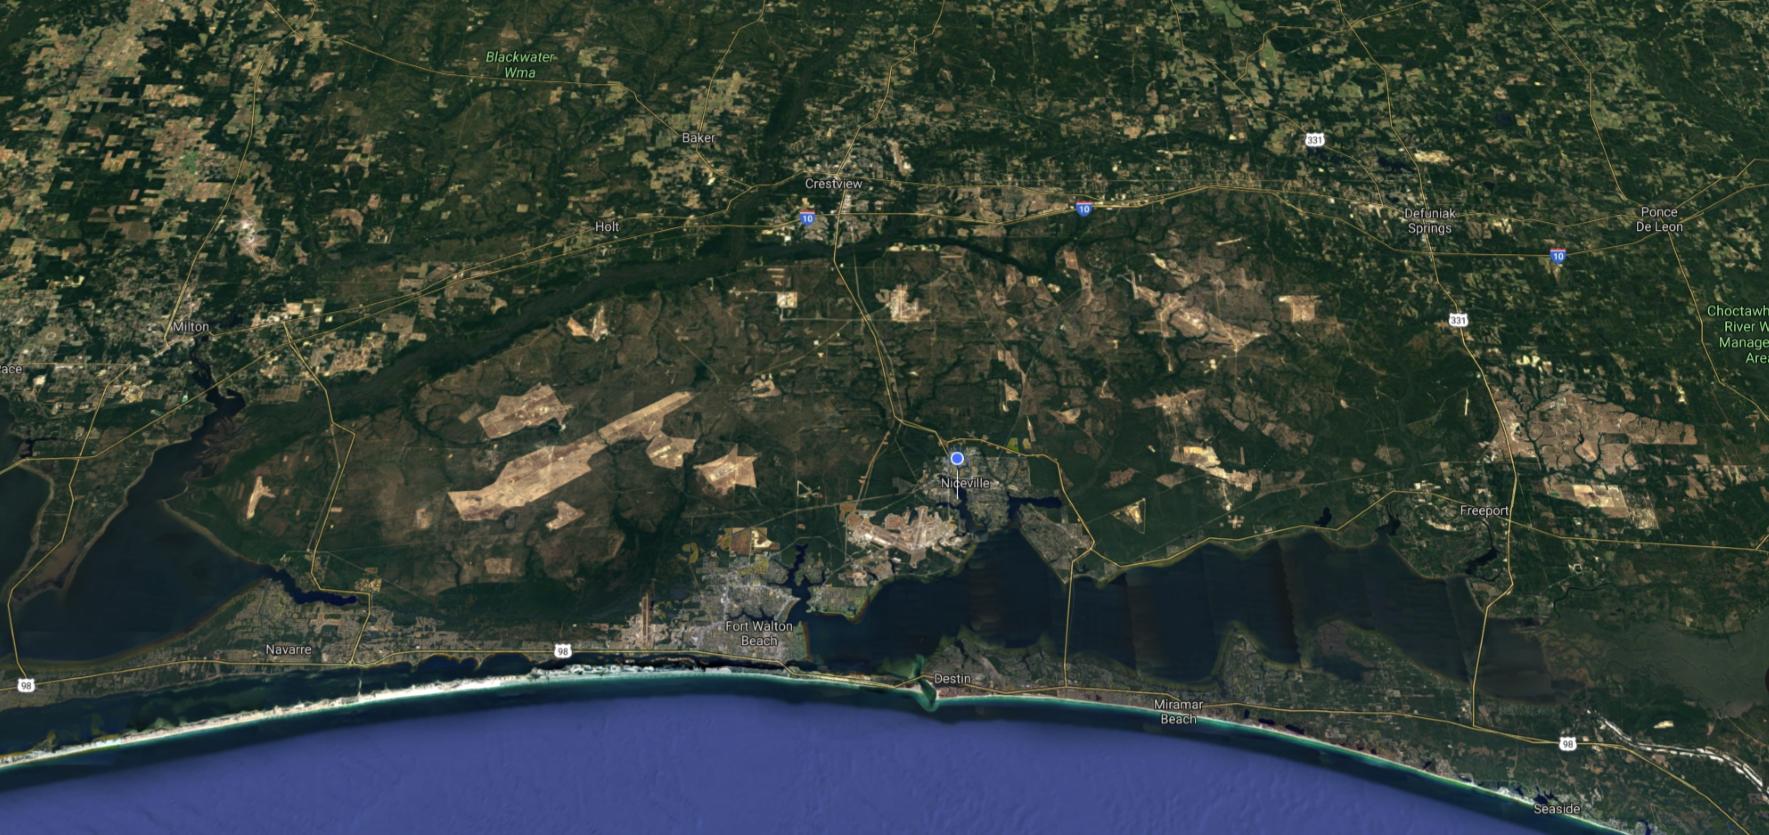 About the Emerald Coast community image